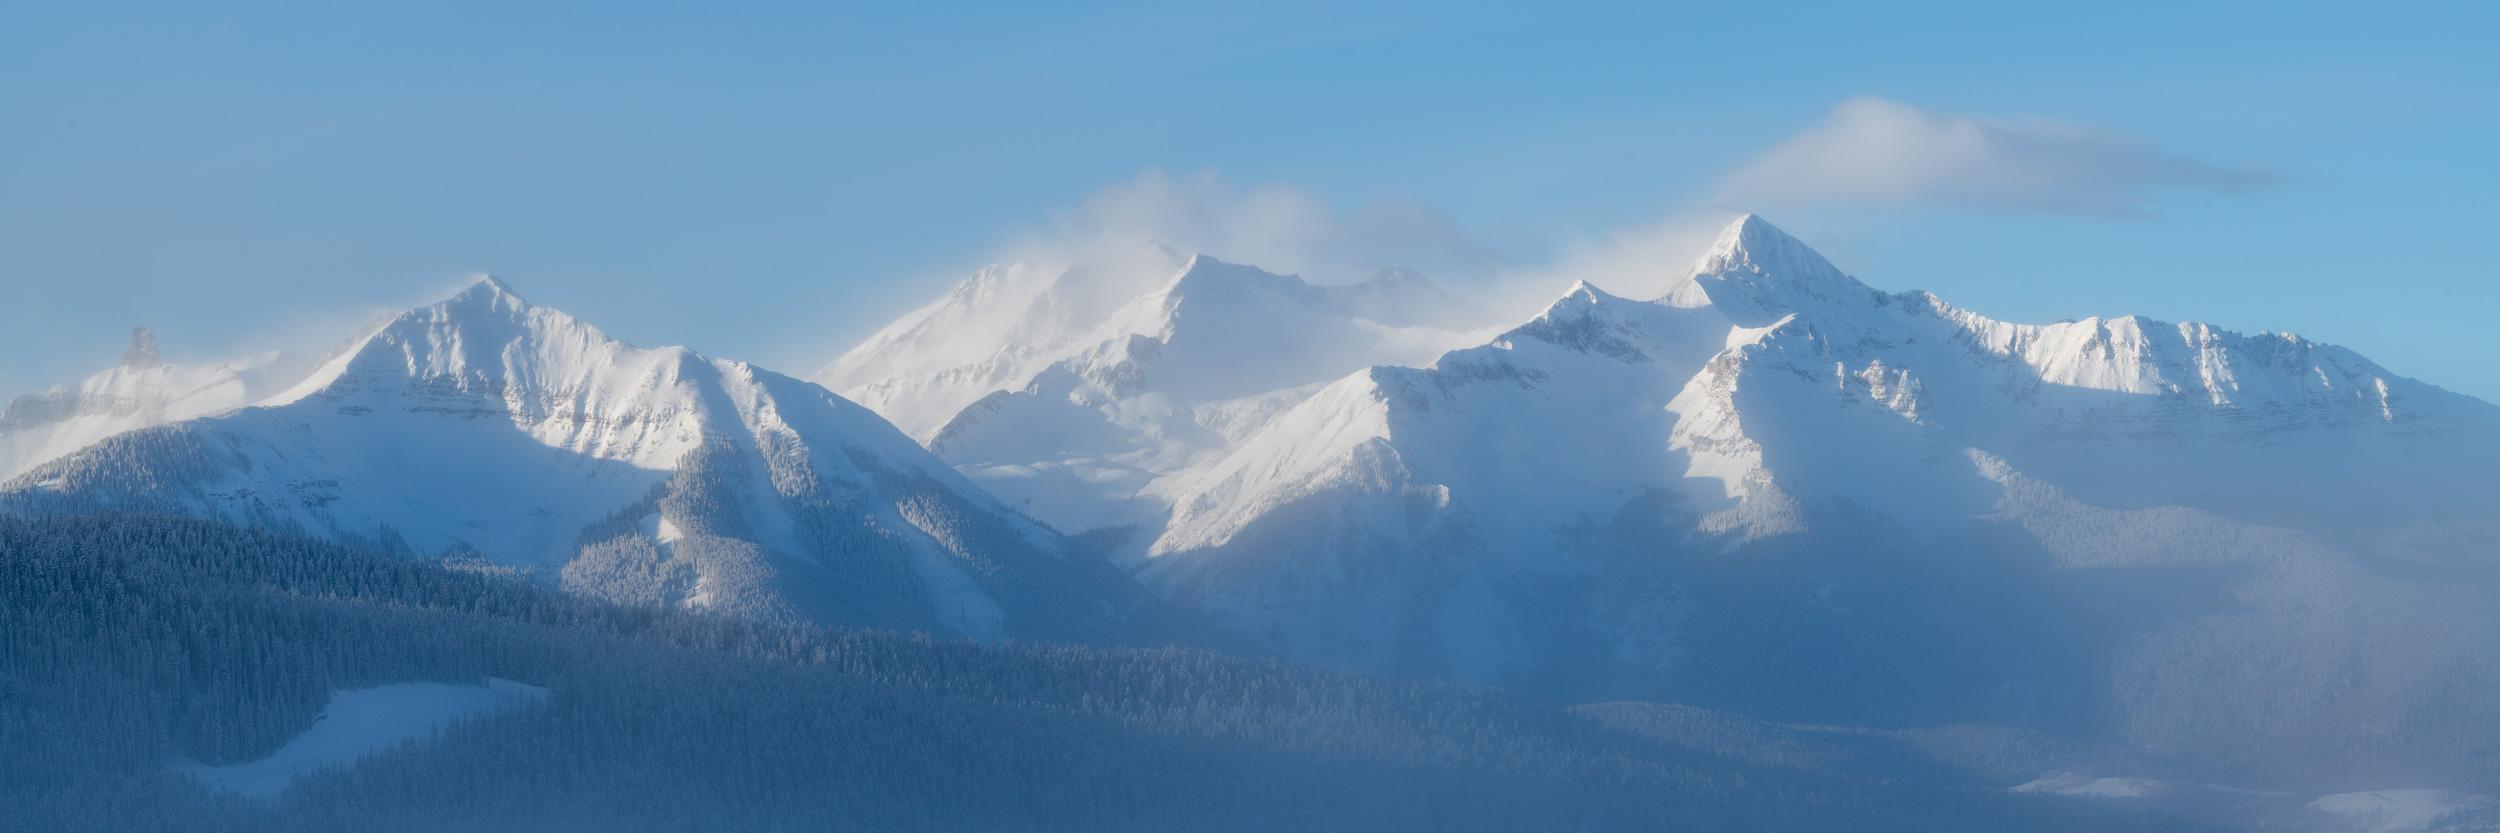 Shrouded Peaks